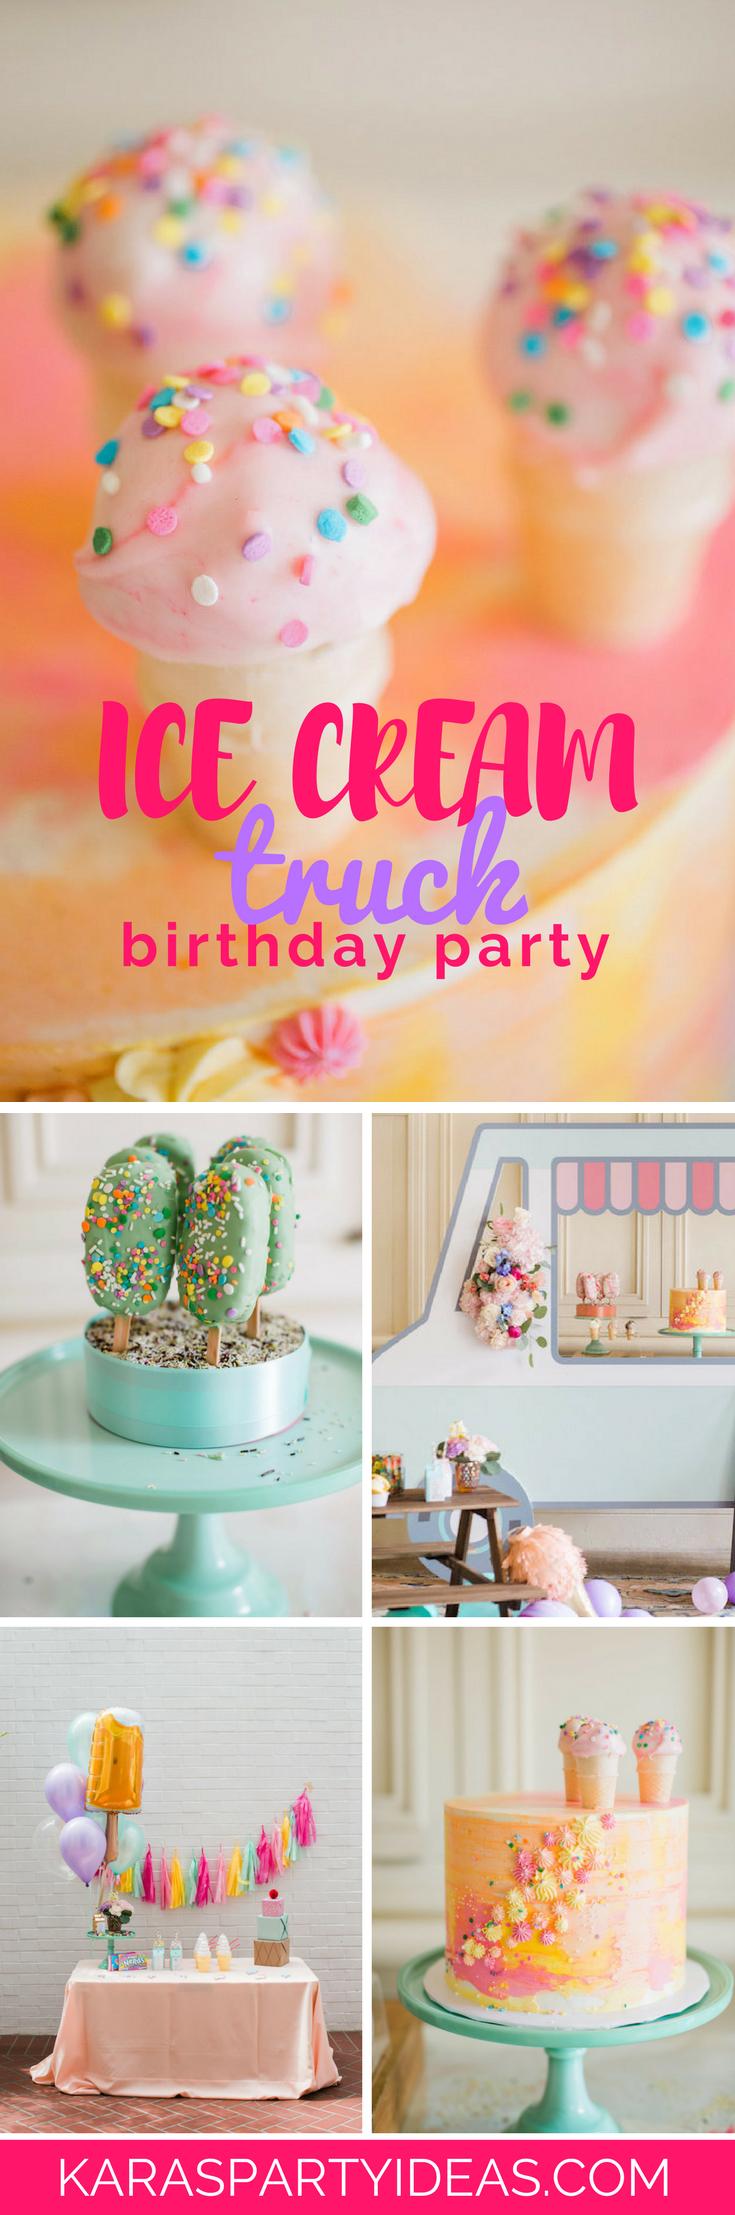 Ice Cream Truck Birthday Party via Kara's Party Ideas - KarasPartyIdeas.com